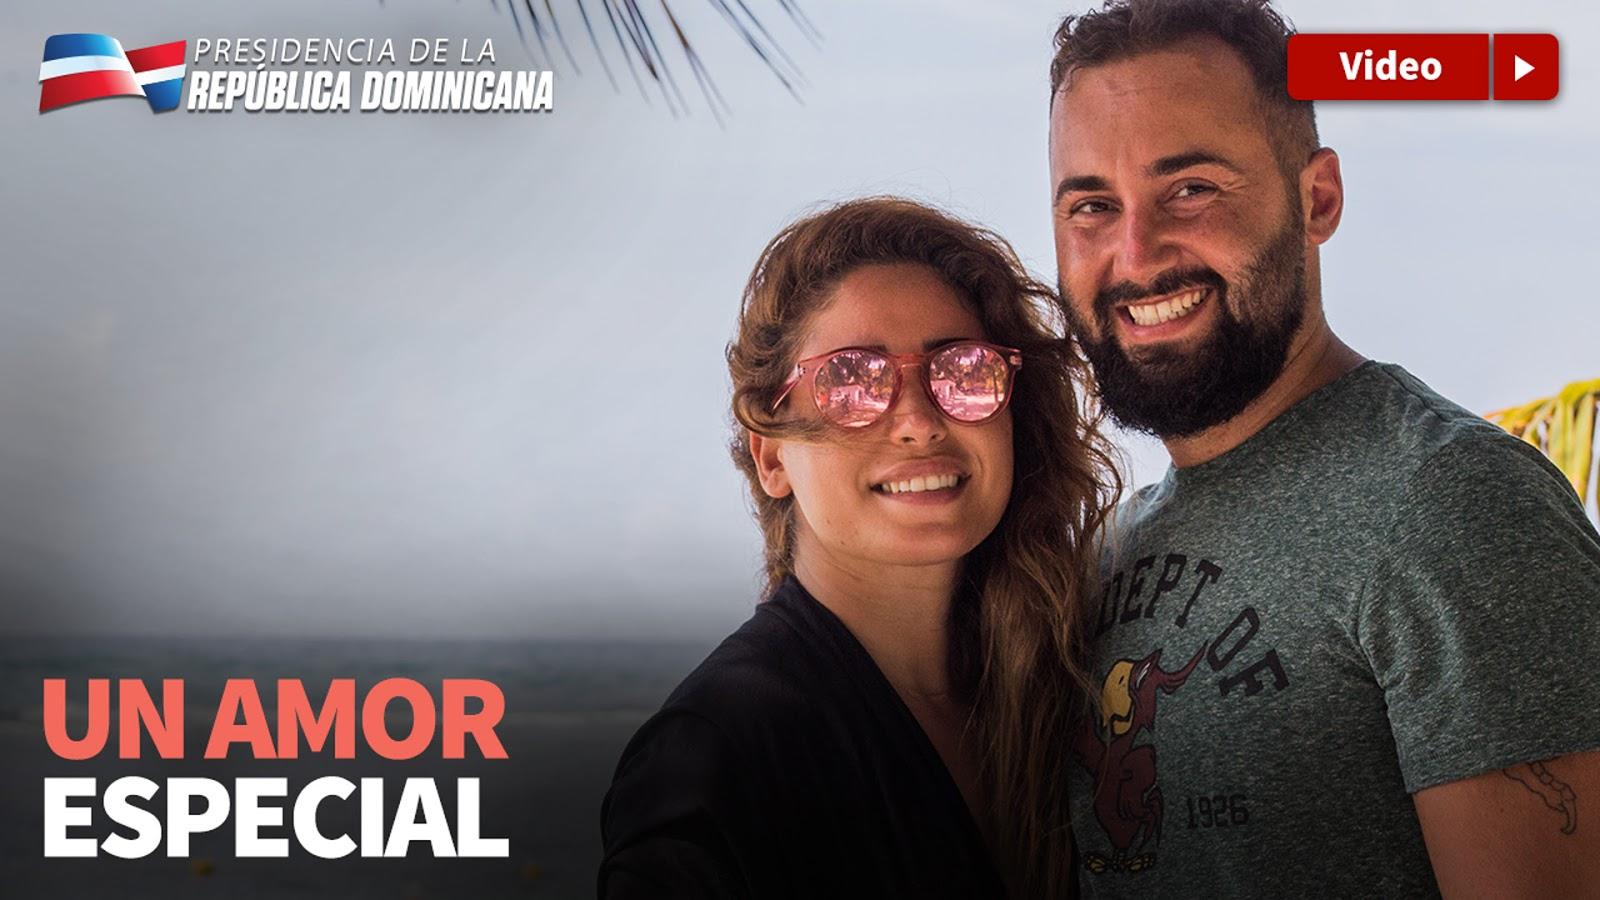 VIDEO: Un amor especial